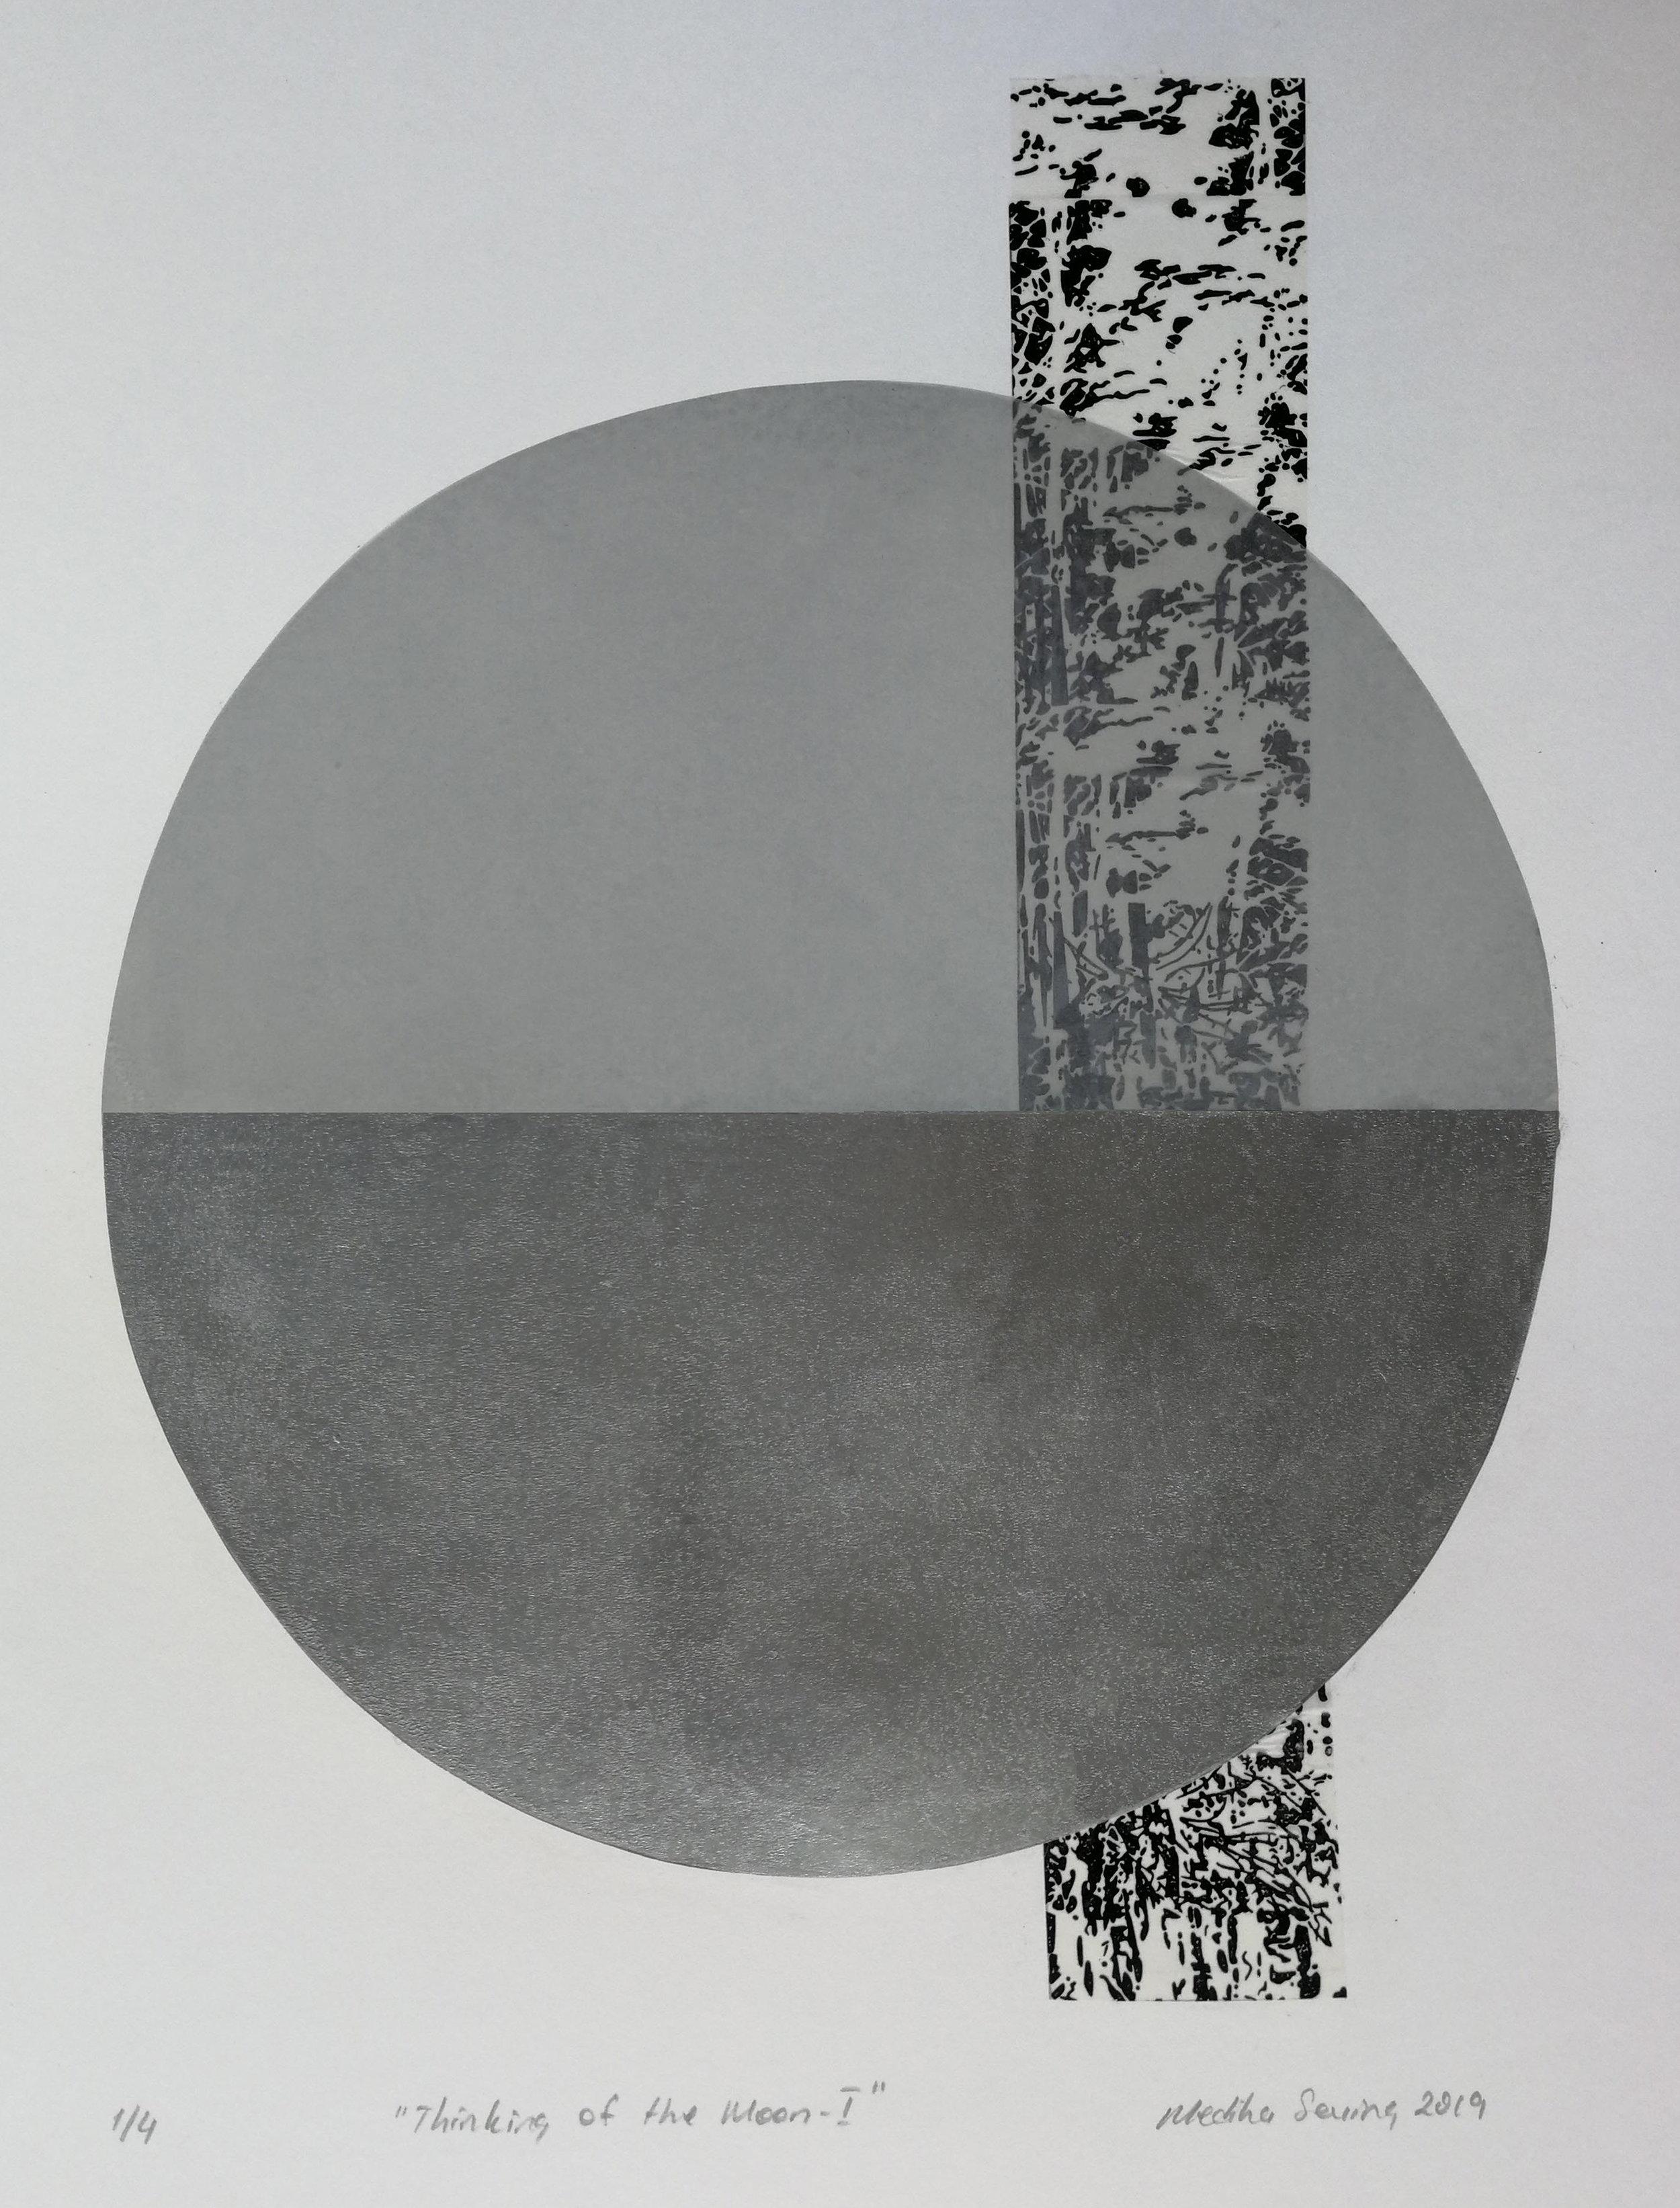 1. Mediha Sevinc, Thinking of the Moon- I, 25,2x32,3cm, 2019.jpg